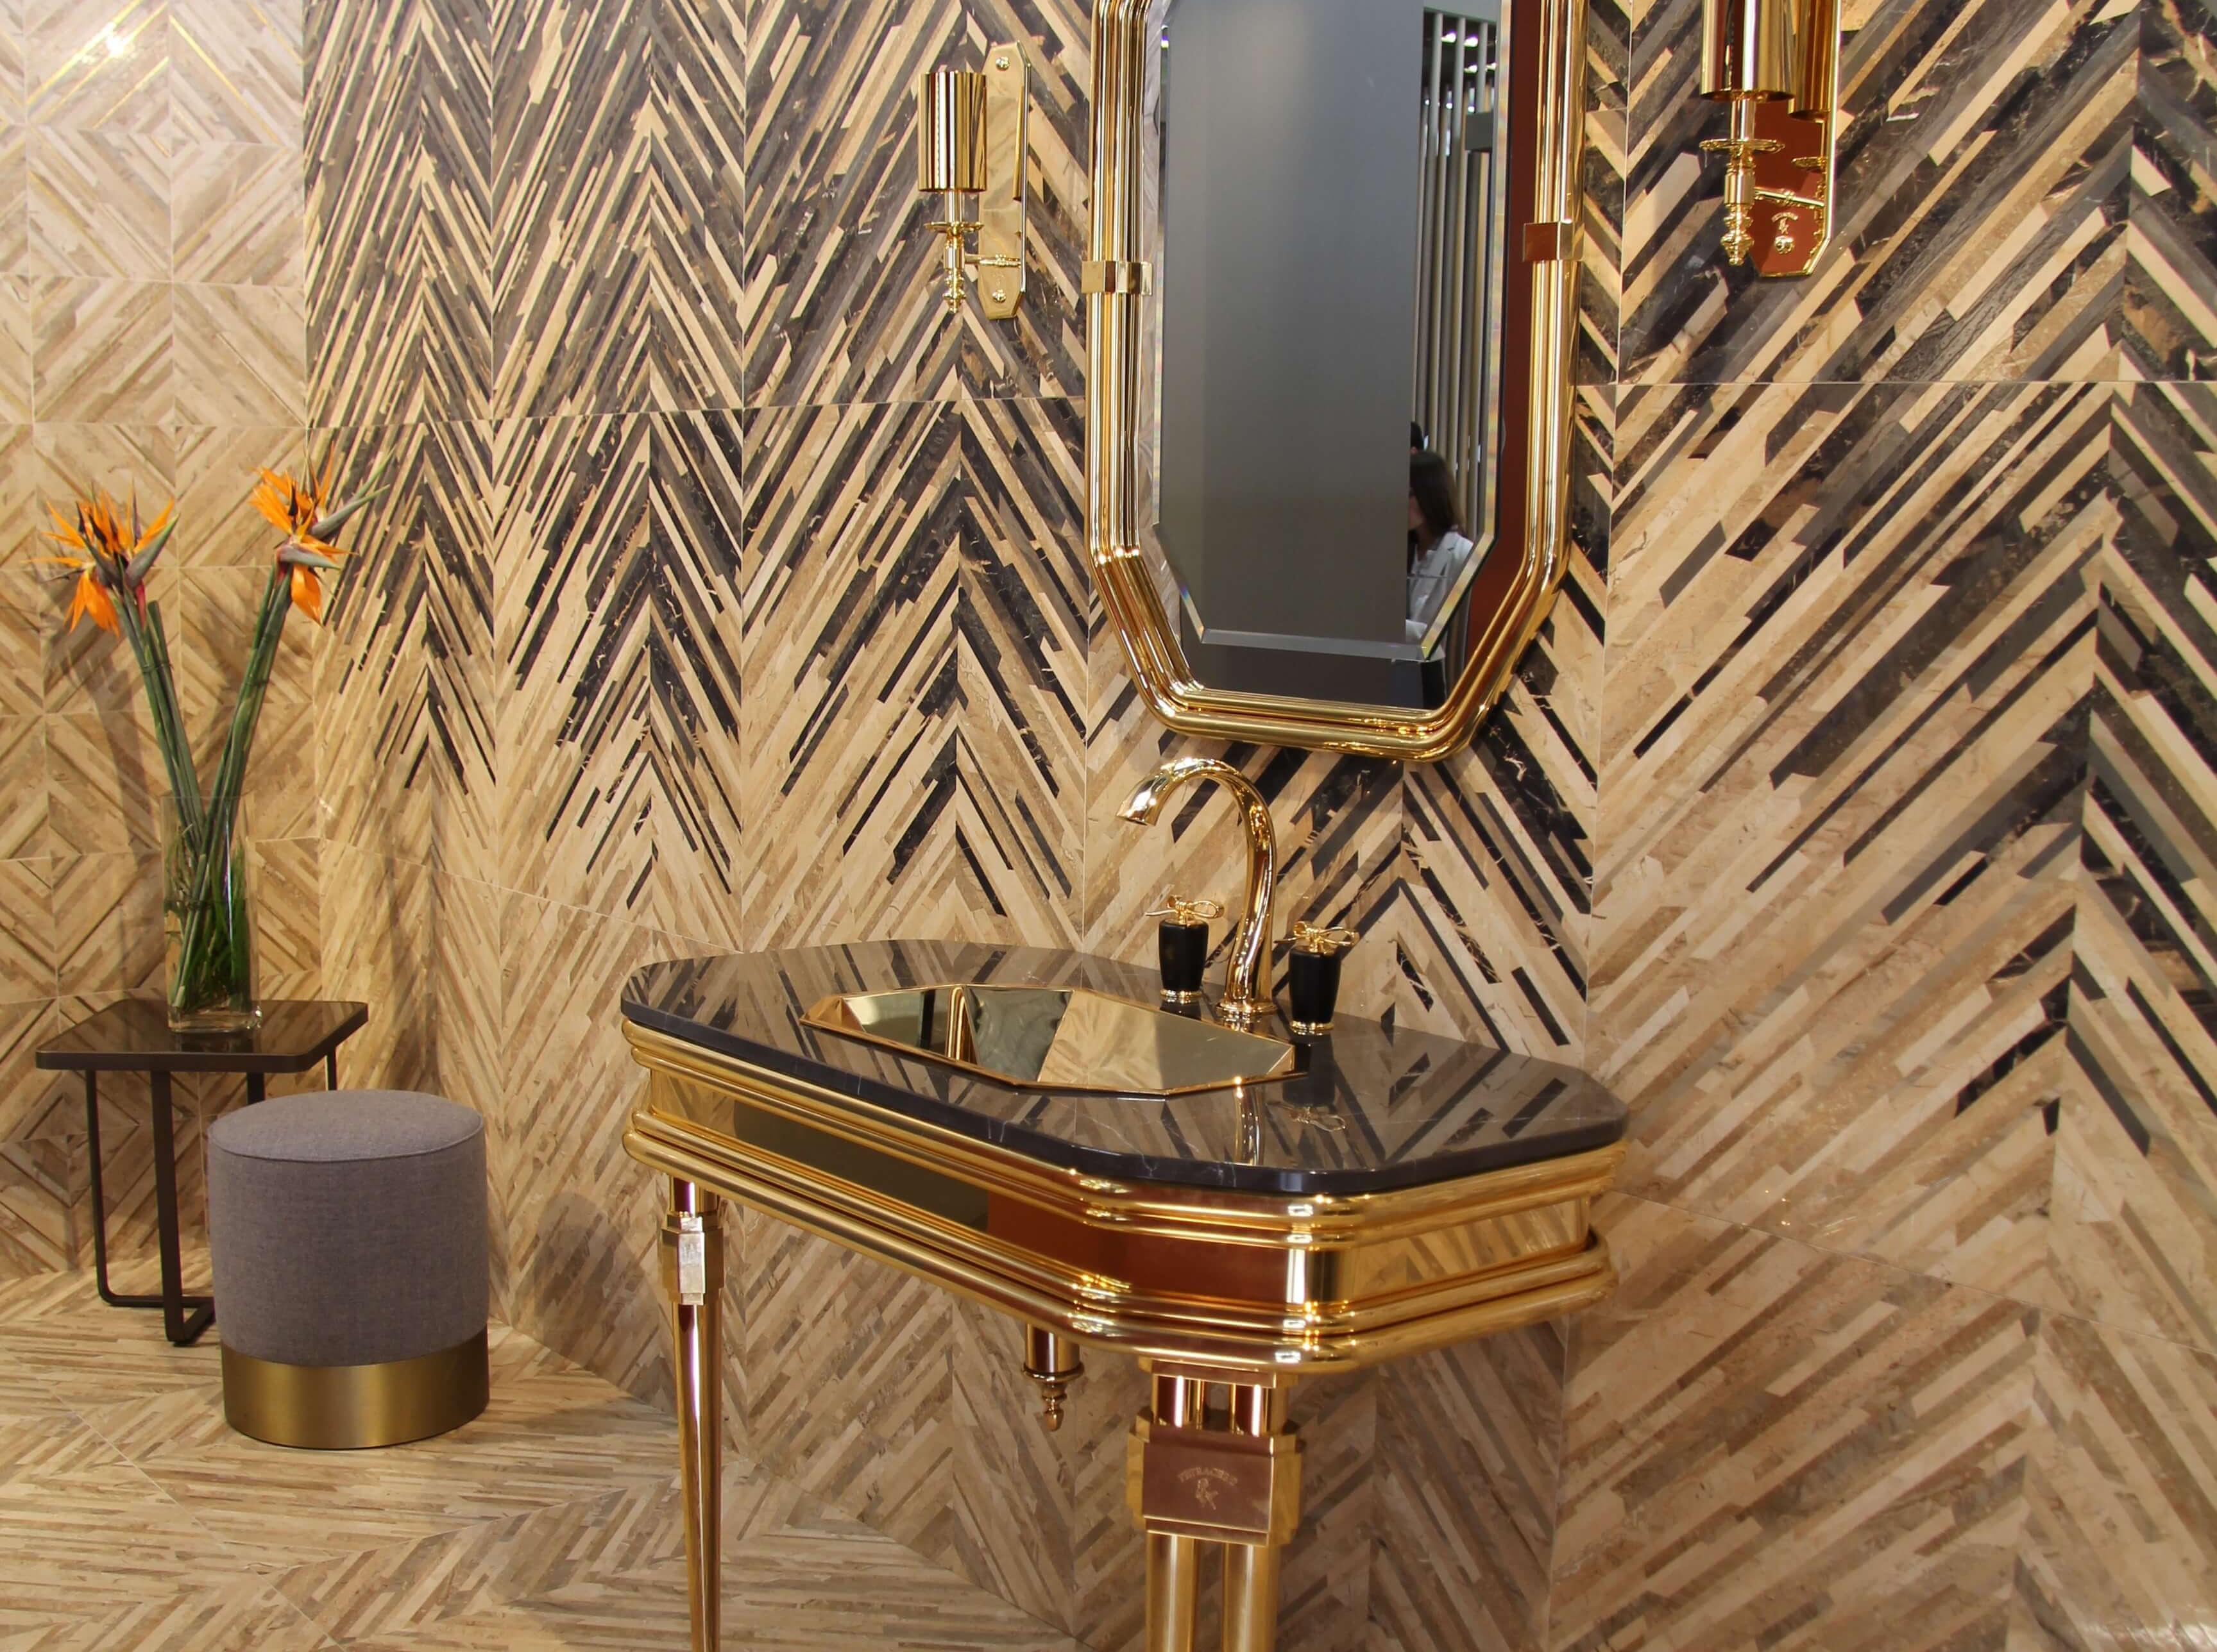 cersaie 2018 last news trends und impressionen. Black Bedroom Furniture Sets. Home Design Ideas